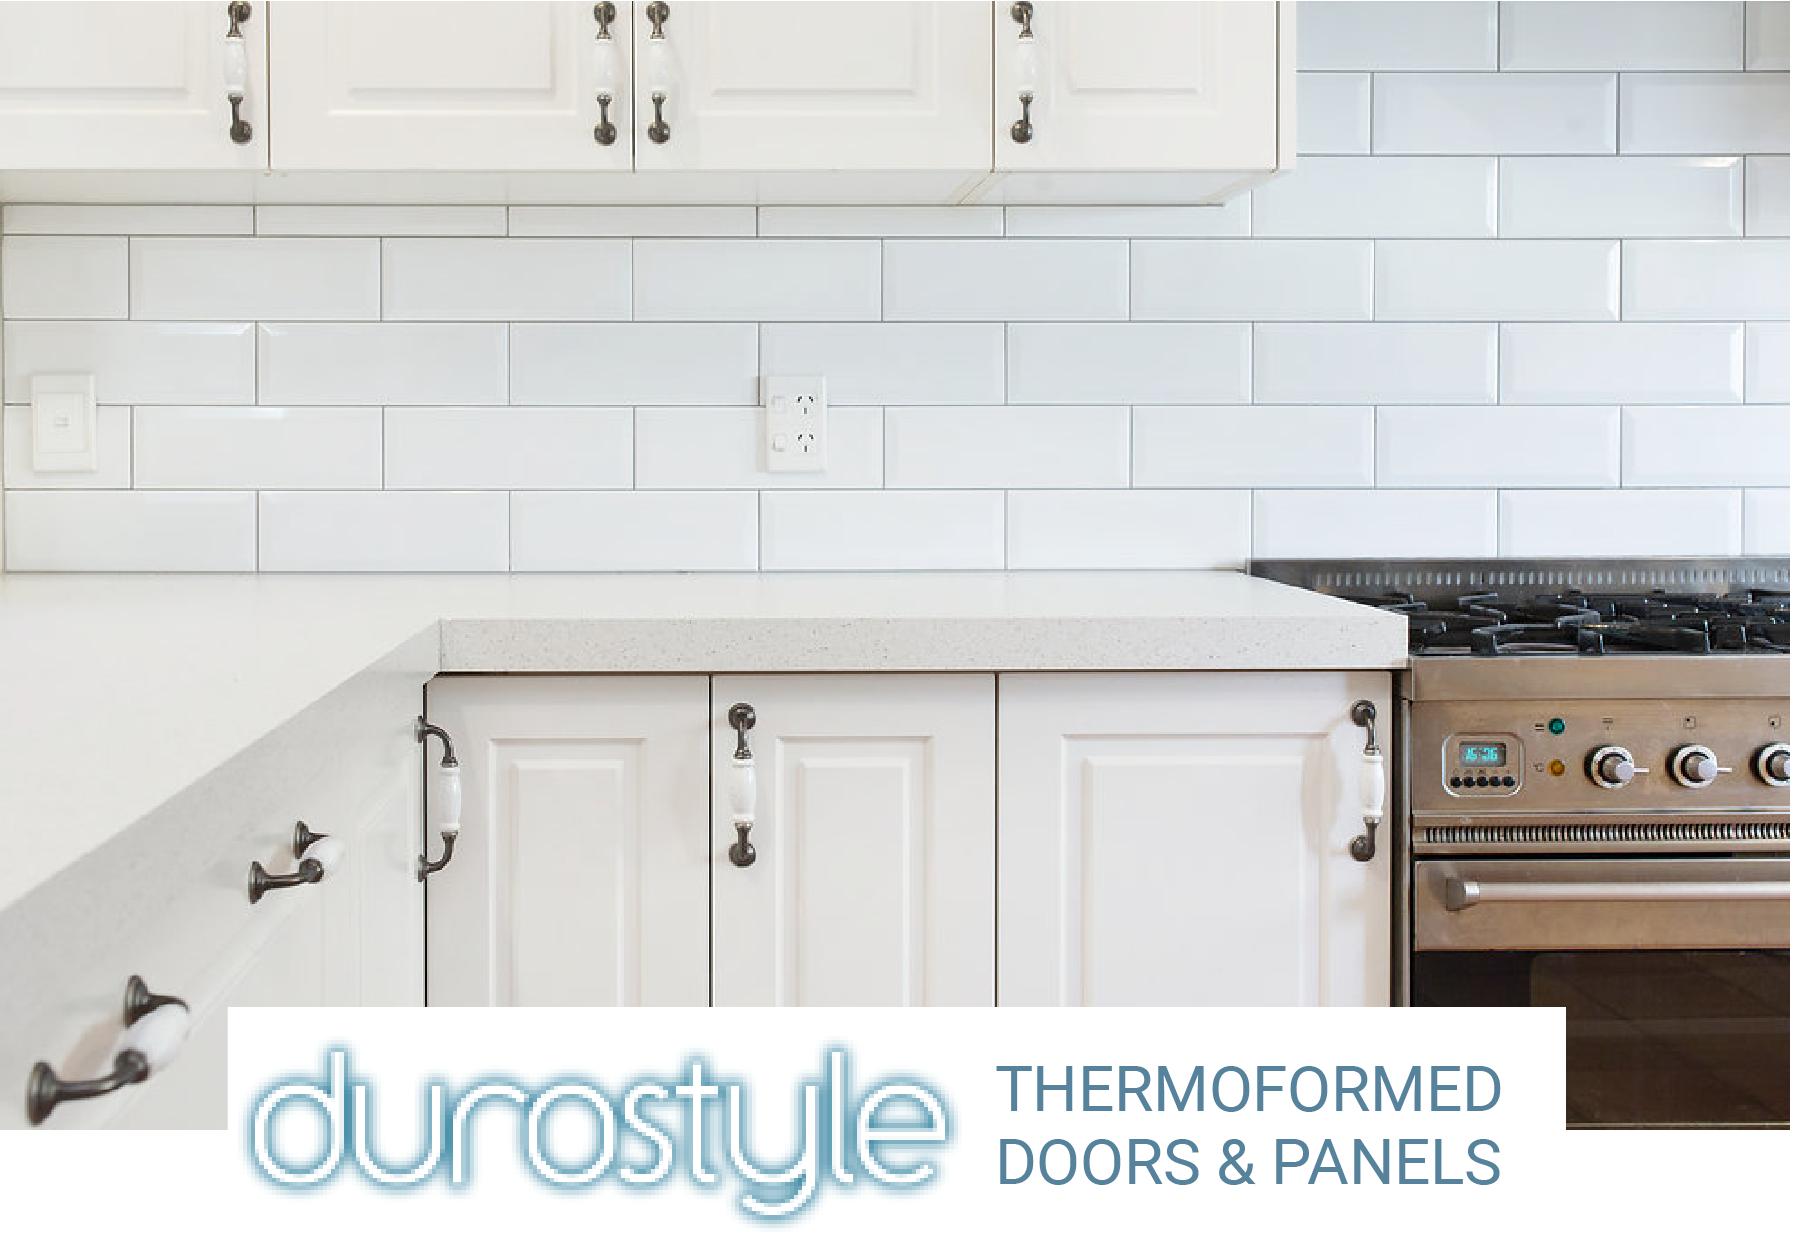 Kitchen Cabinet Doors Thermoformed Melamine Mdf Acrylic Doors Panels